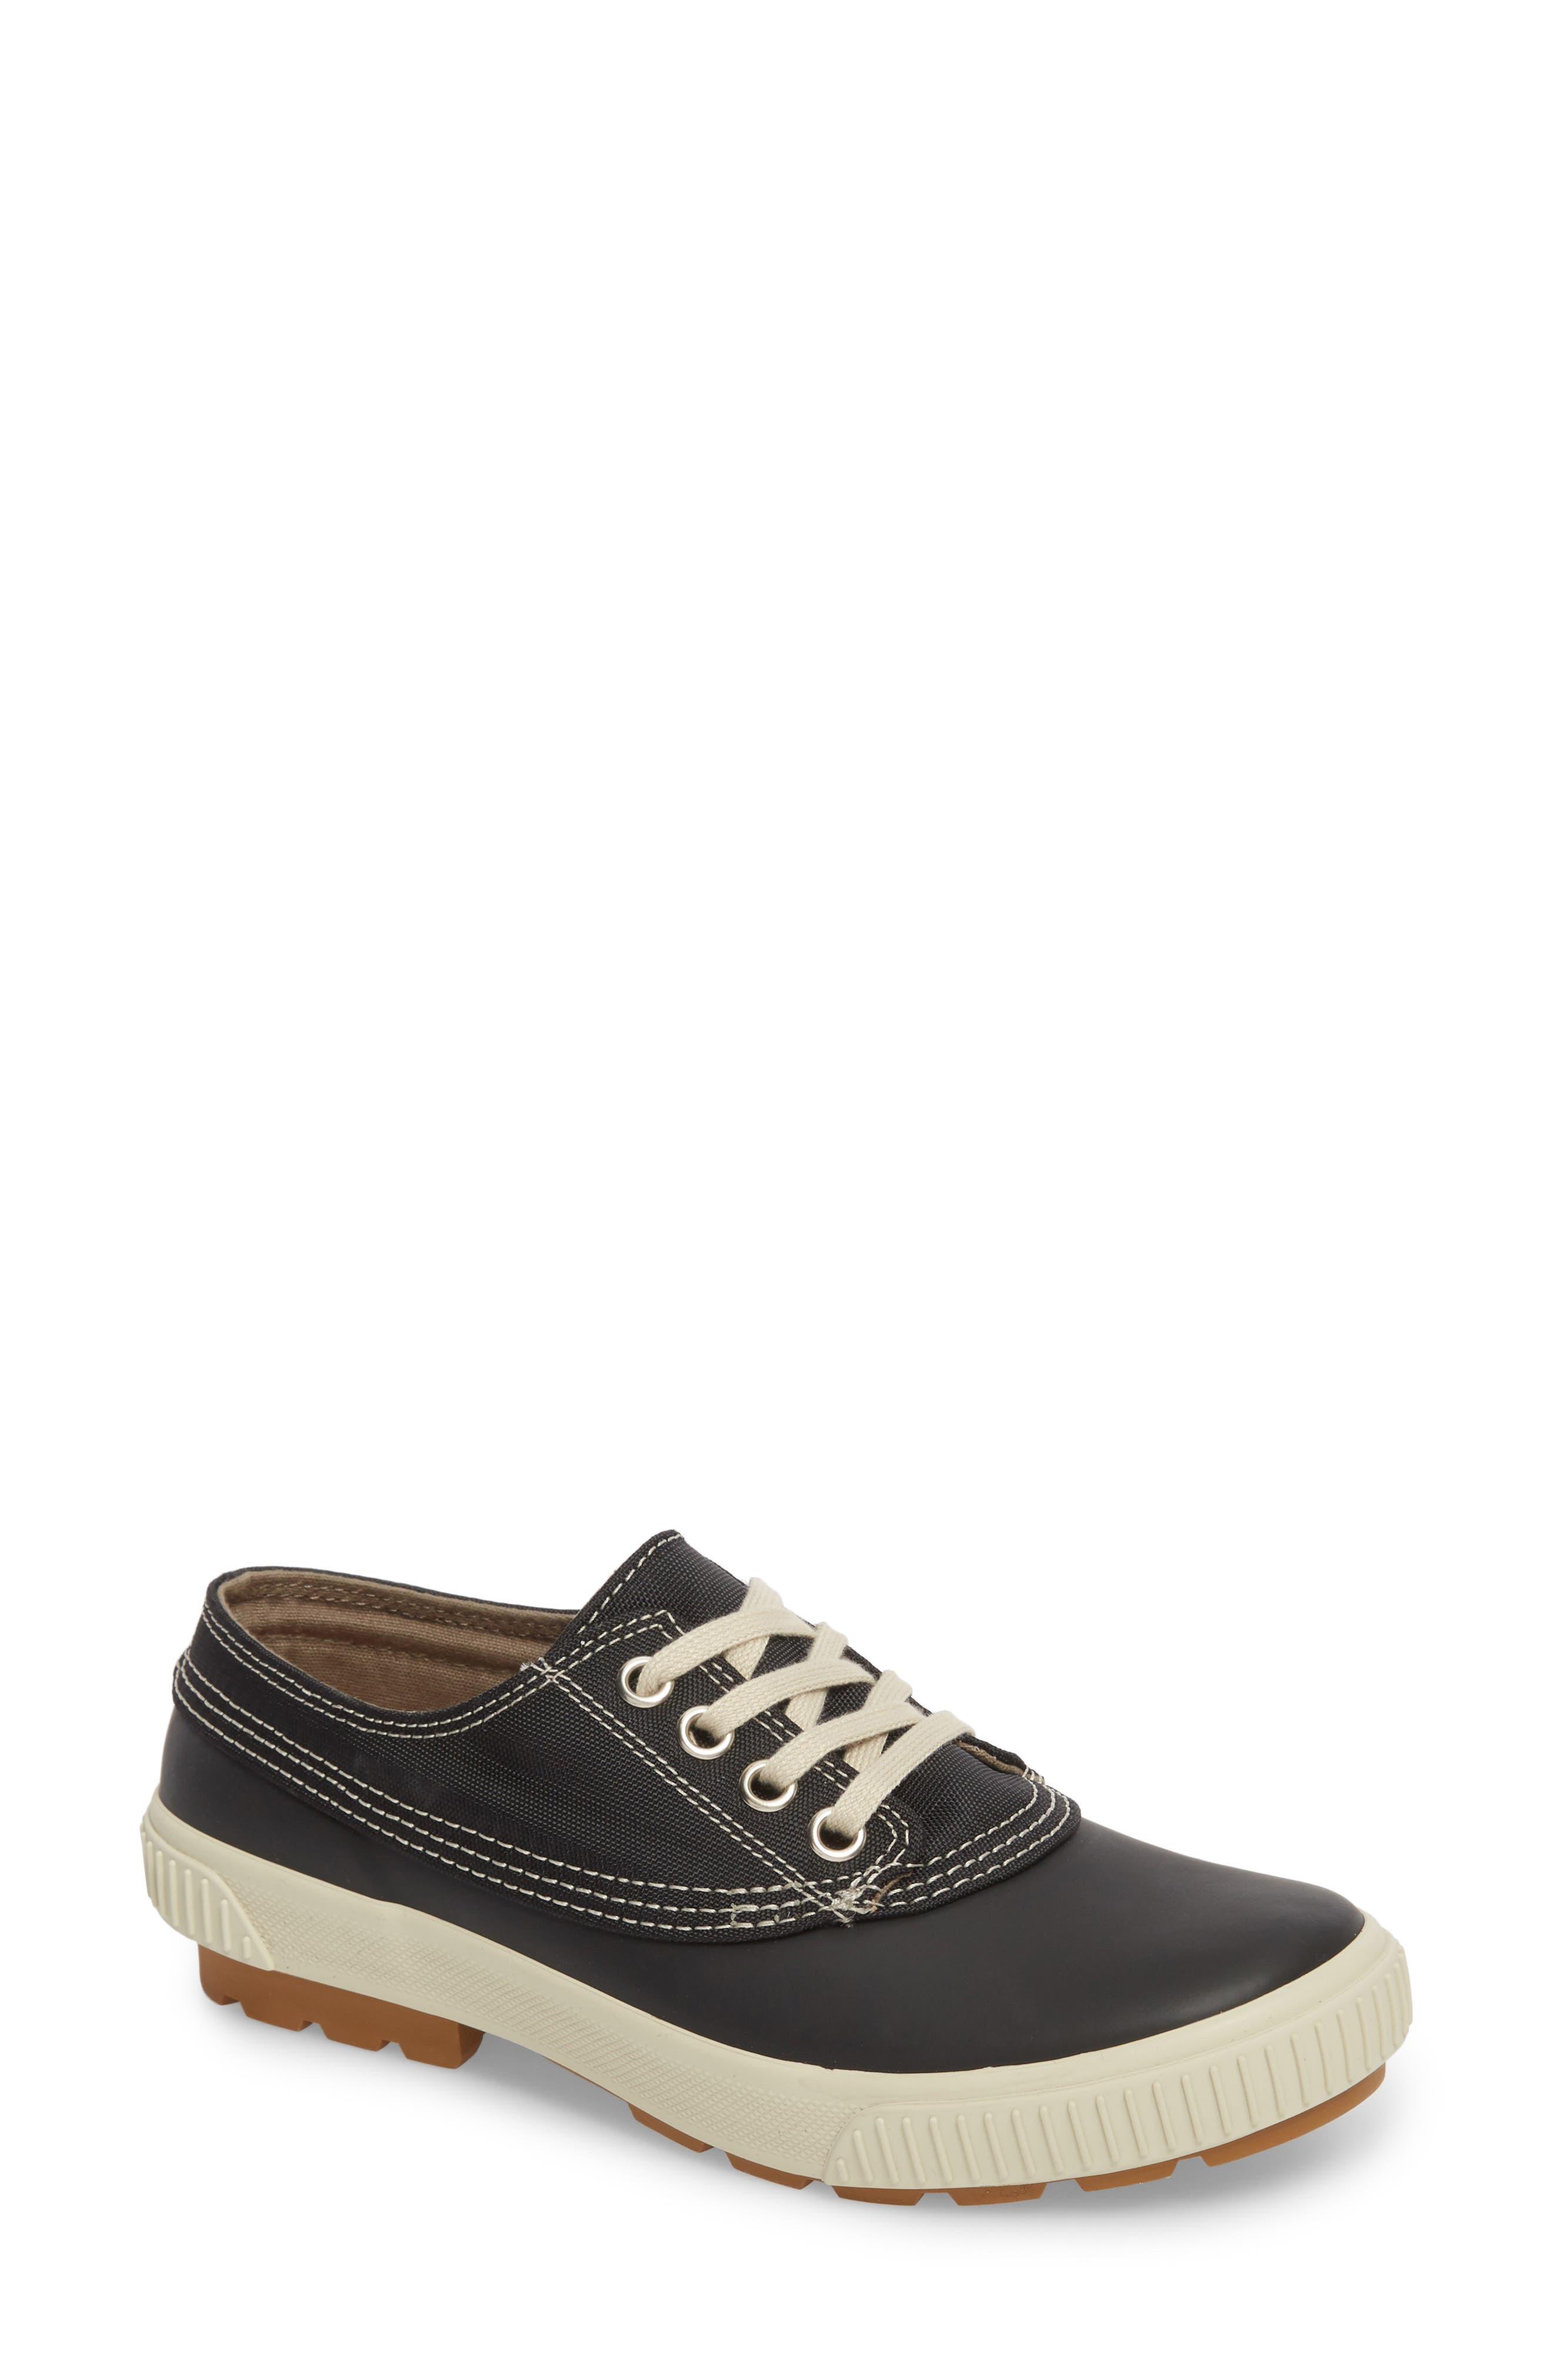 Dash Duck Sneaker,                         Main,                         color, 001